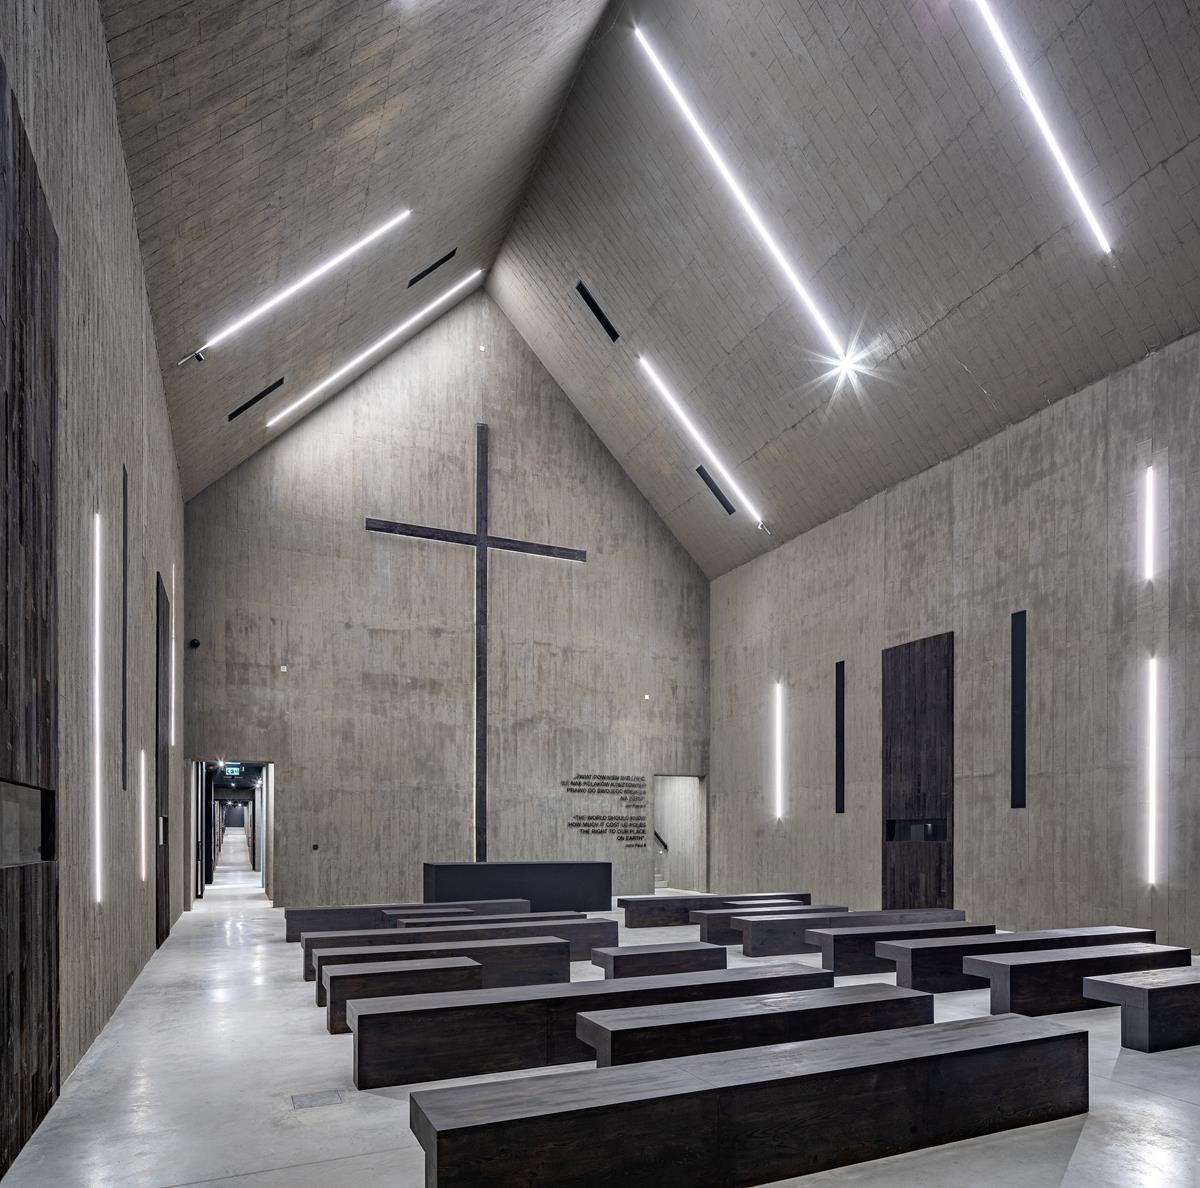 Nizio-Design_Mausoleum_fot-Marcin-Czechowicz_designalive-13